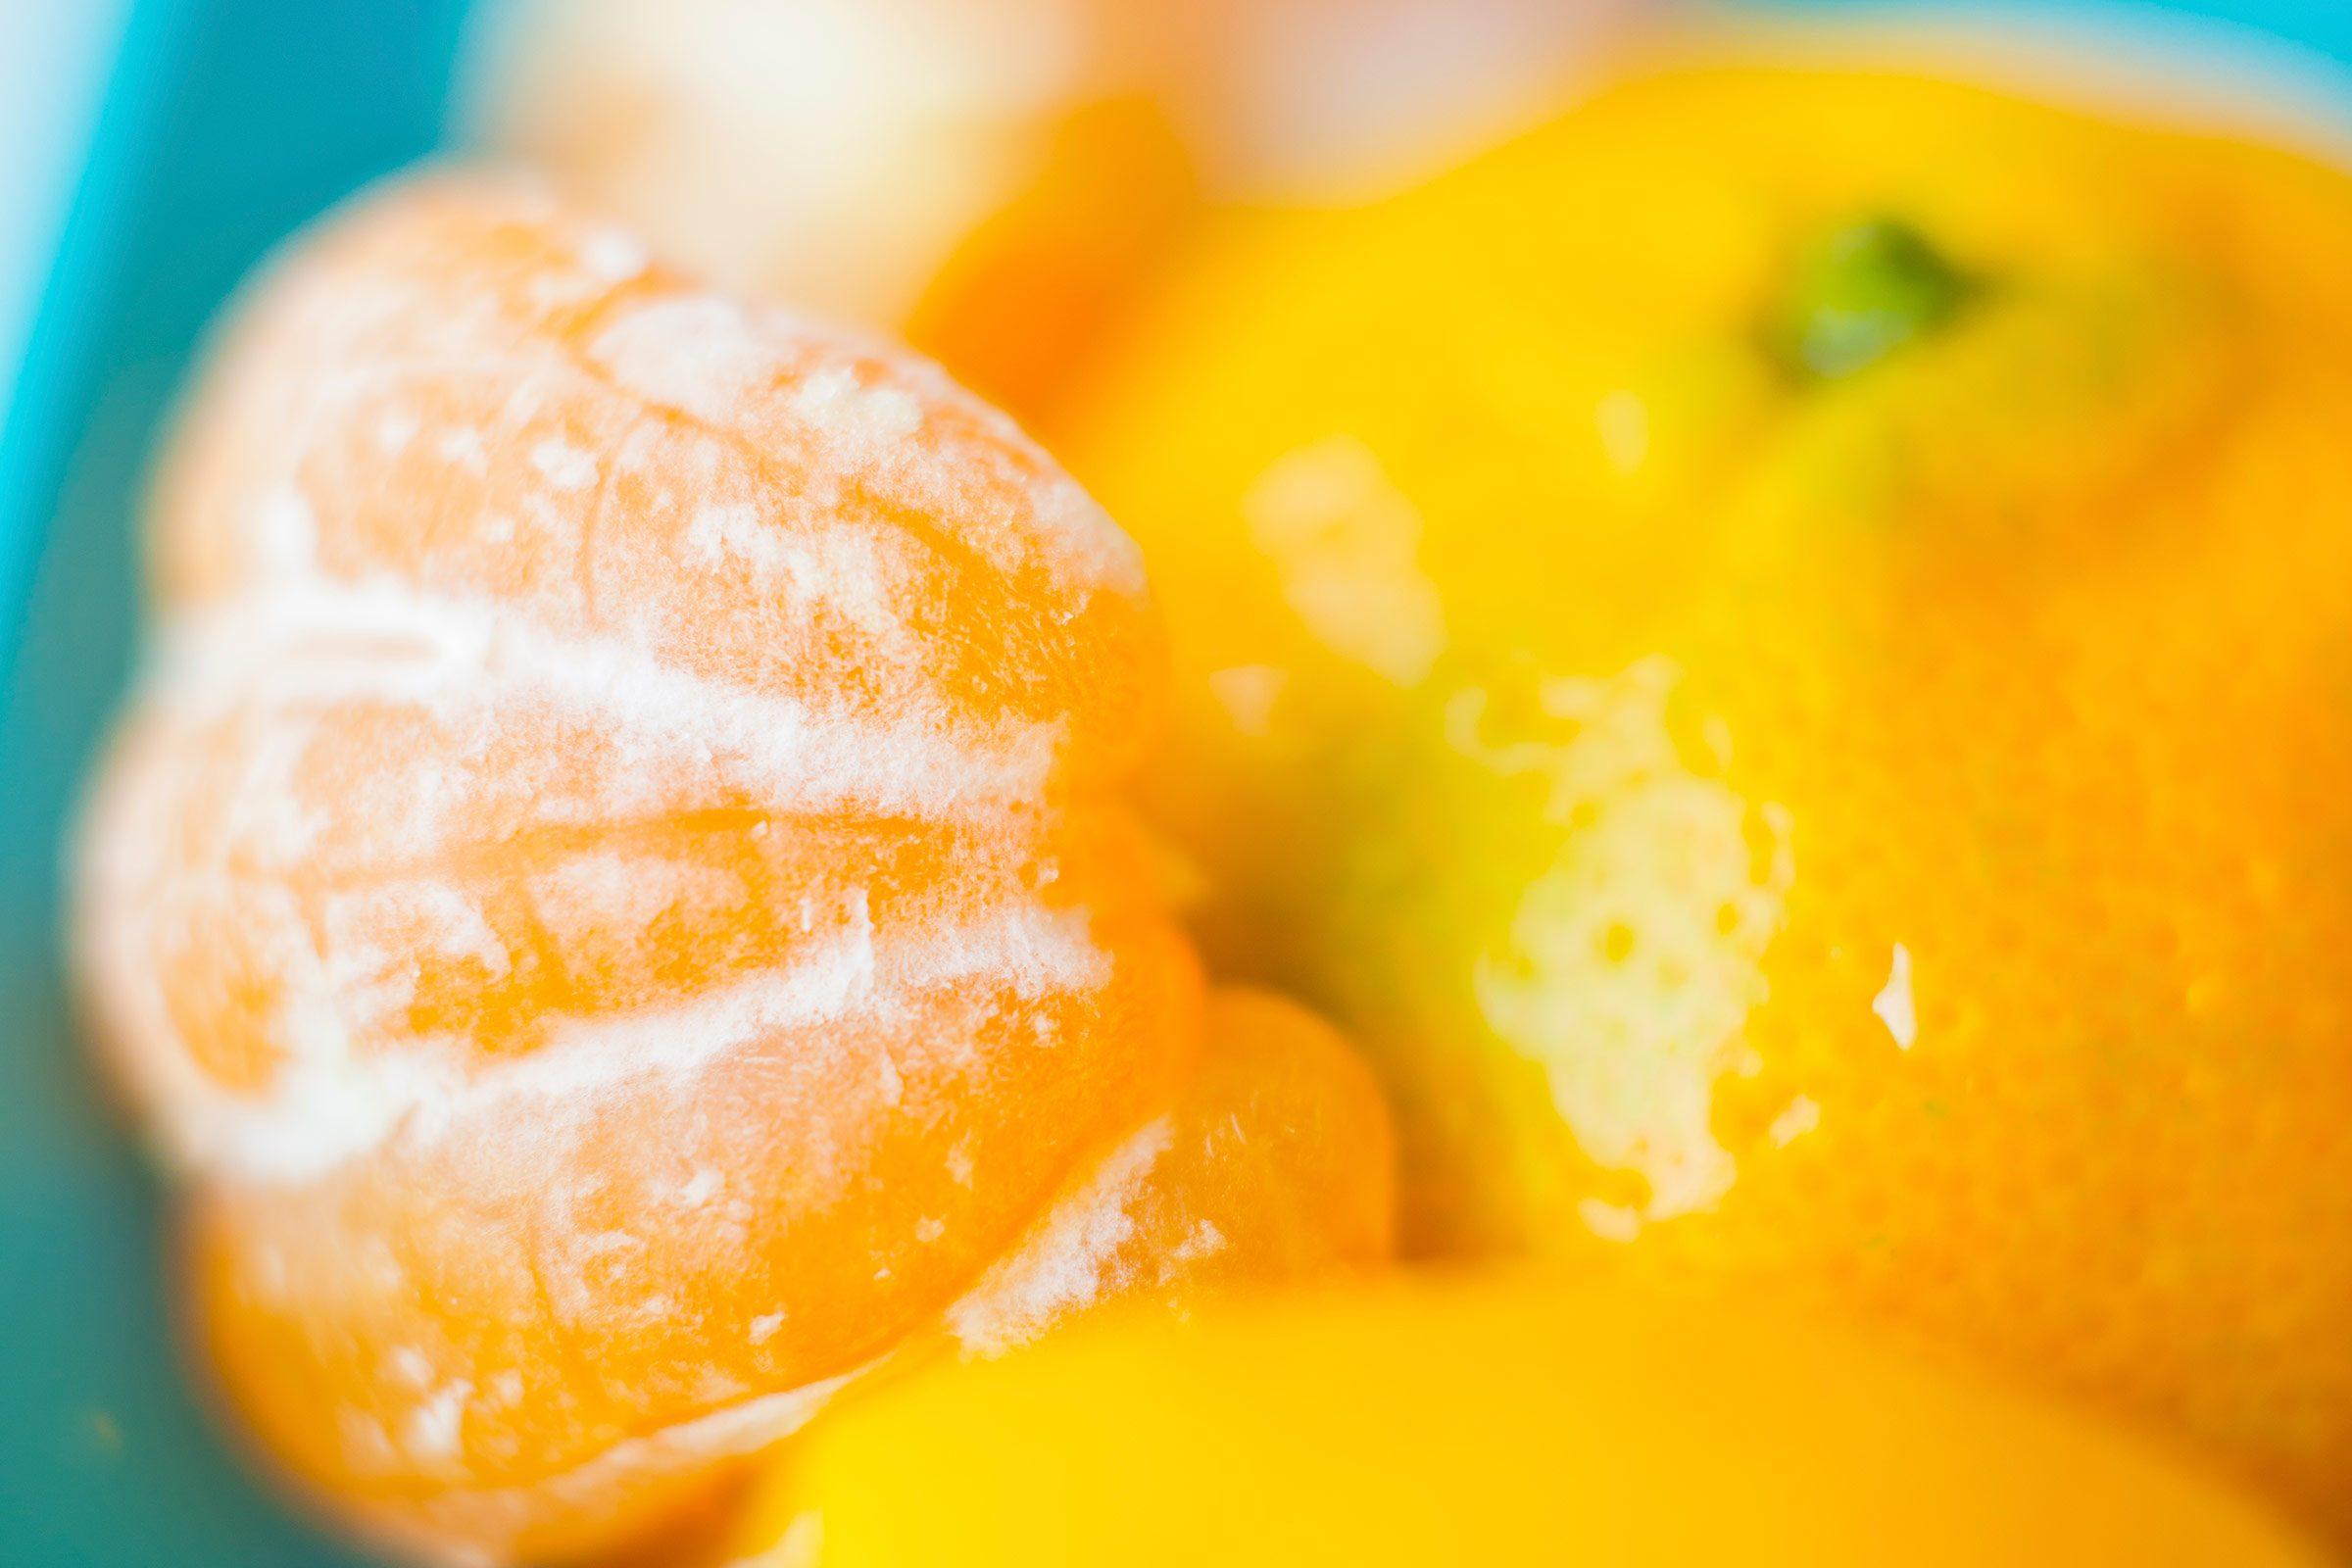 Snack on citrus.